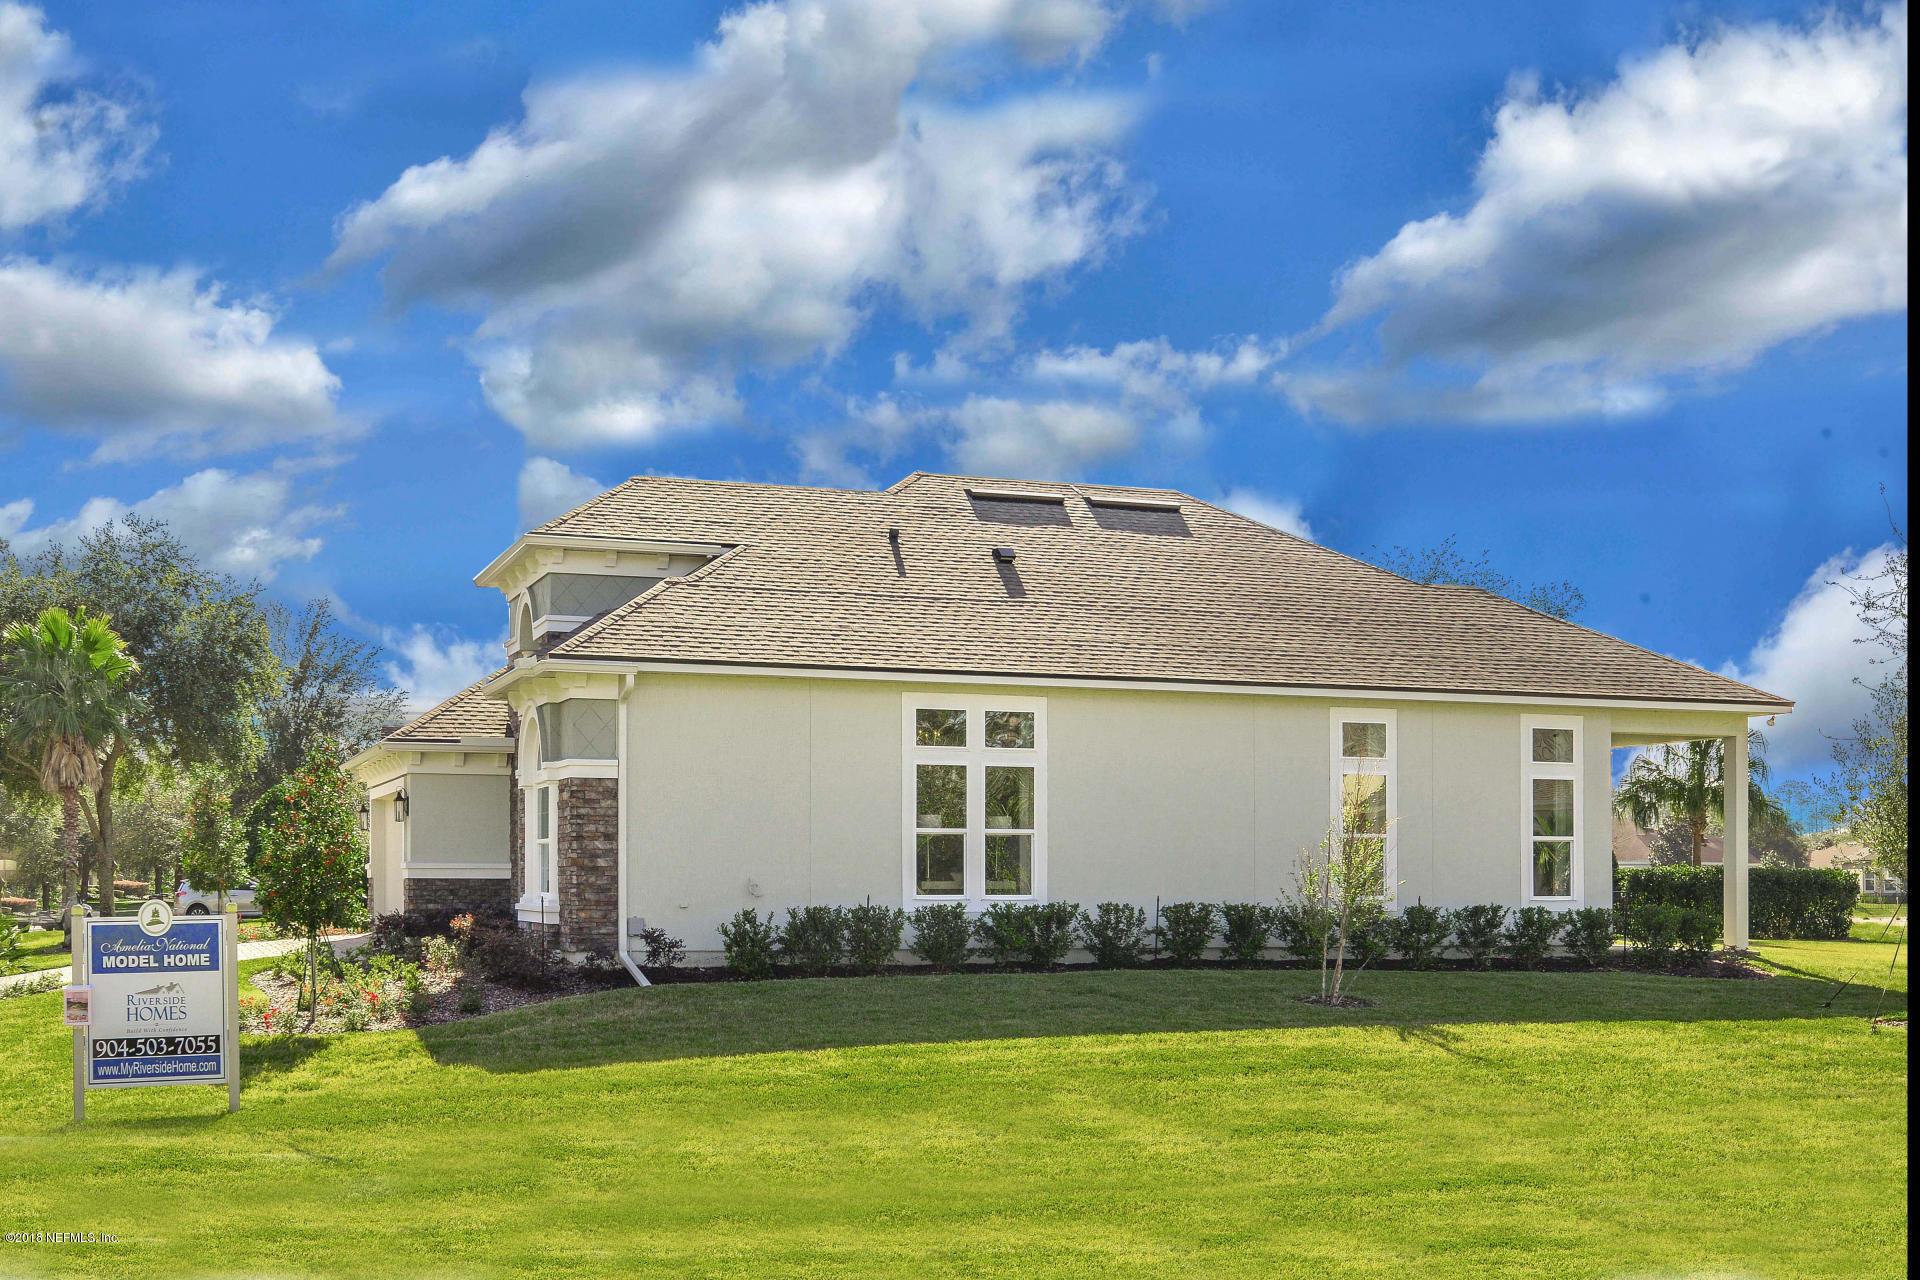 95180 AMELIA NATIONAL, FERNANDINA BEACH, FLORIDA 32034, 3 Bedrooms Bedrooms, ,2 BathroomsBathrooms,Residential - single family,For sale,AMELIA NATIONAL,952372